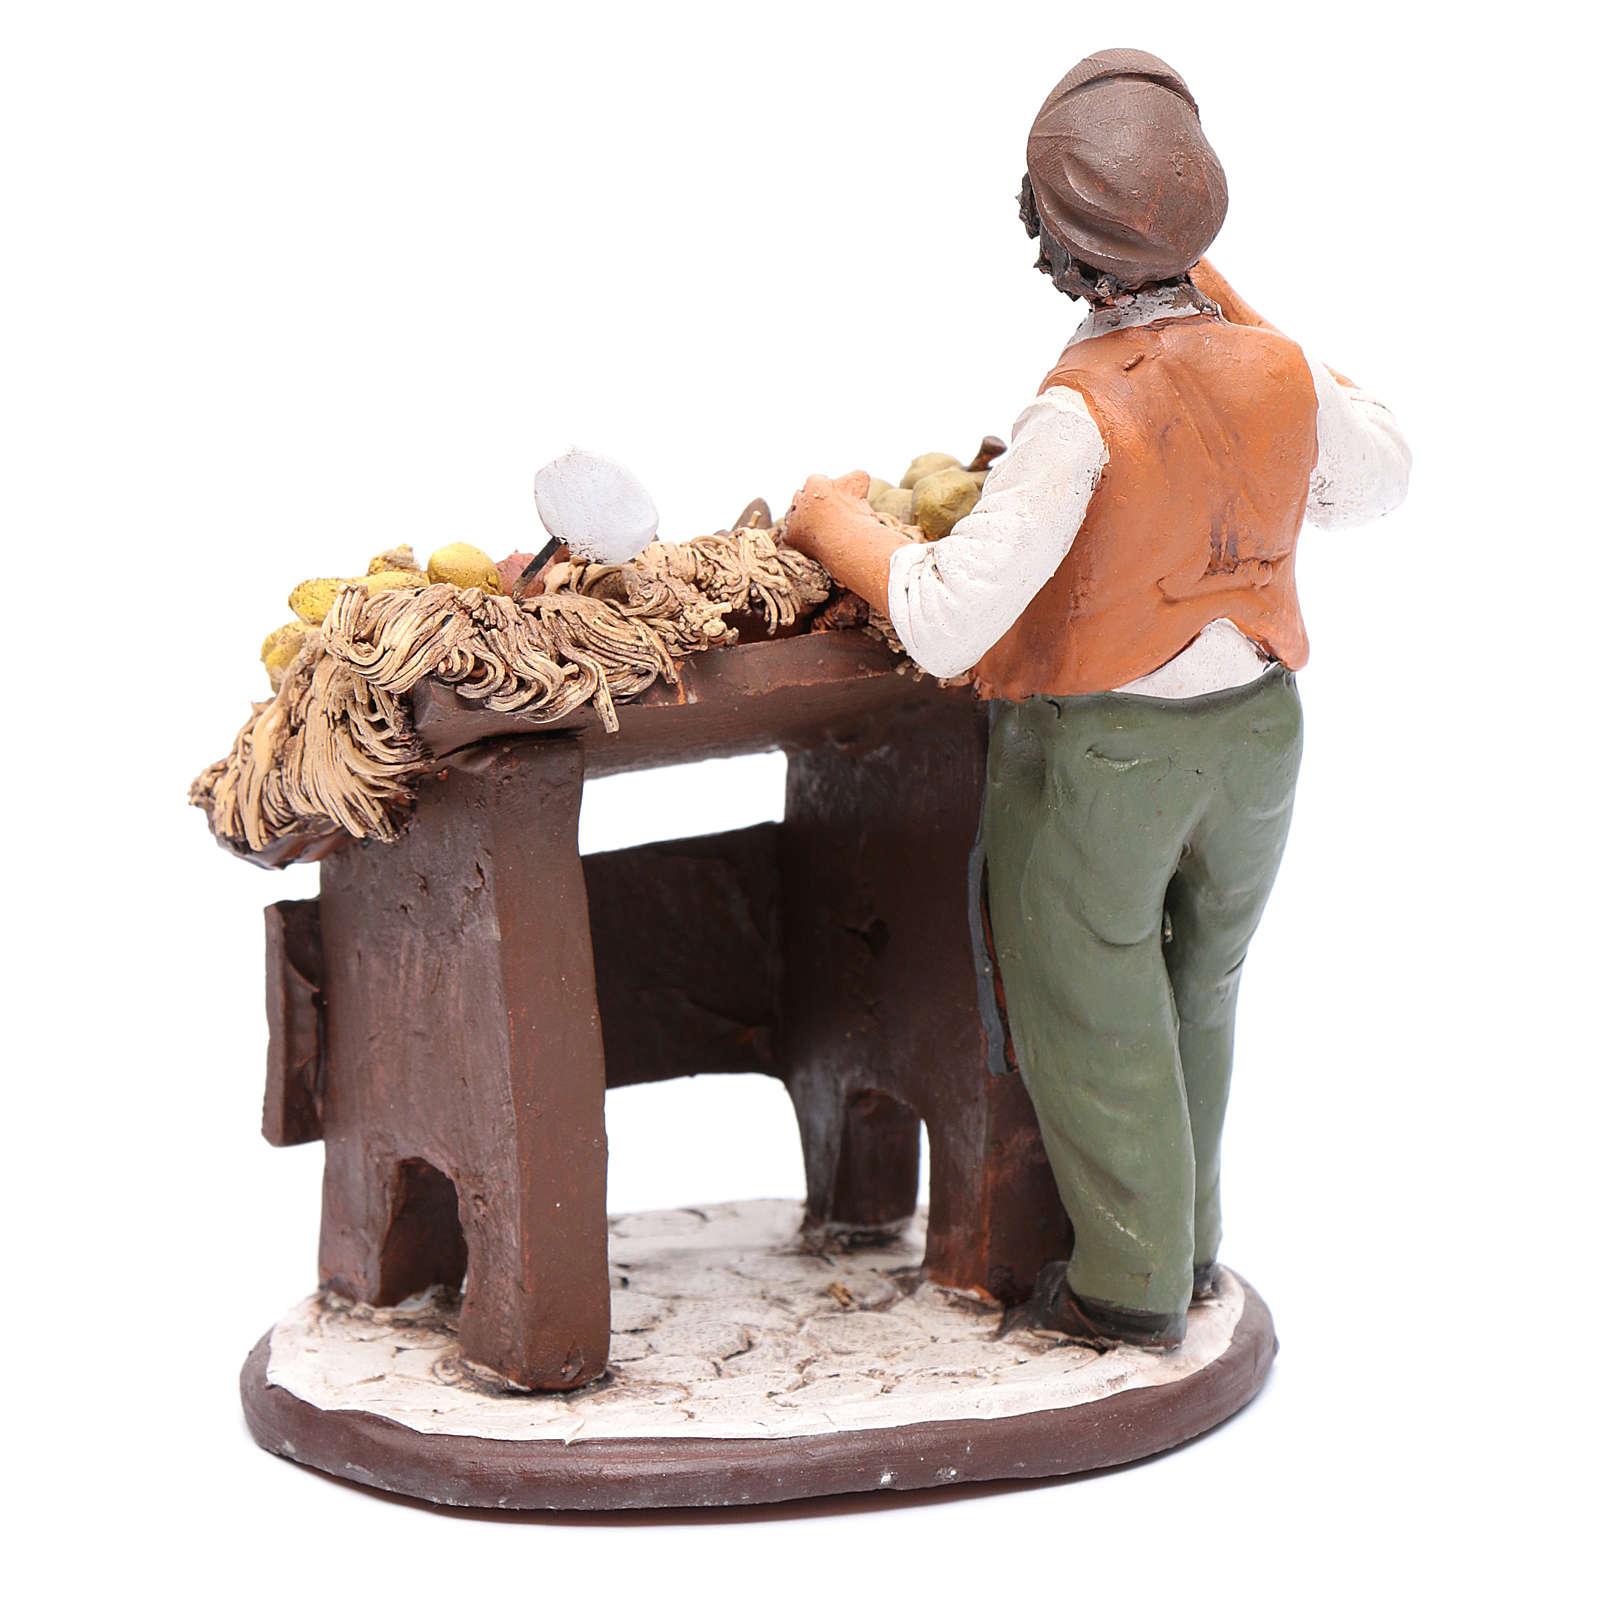 Hombre con mostrador fruta belén Deruta 18 cm de terracota 4